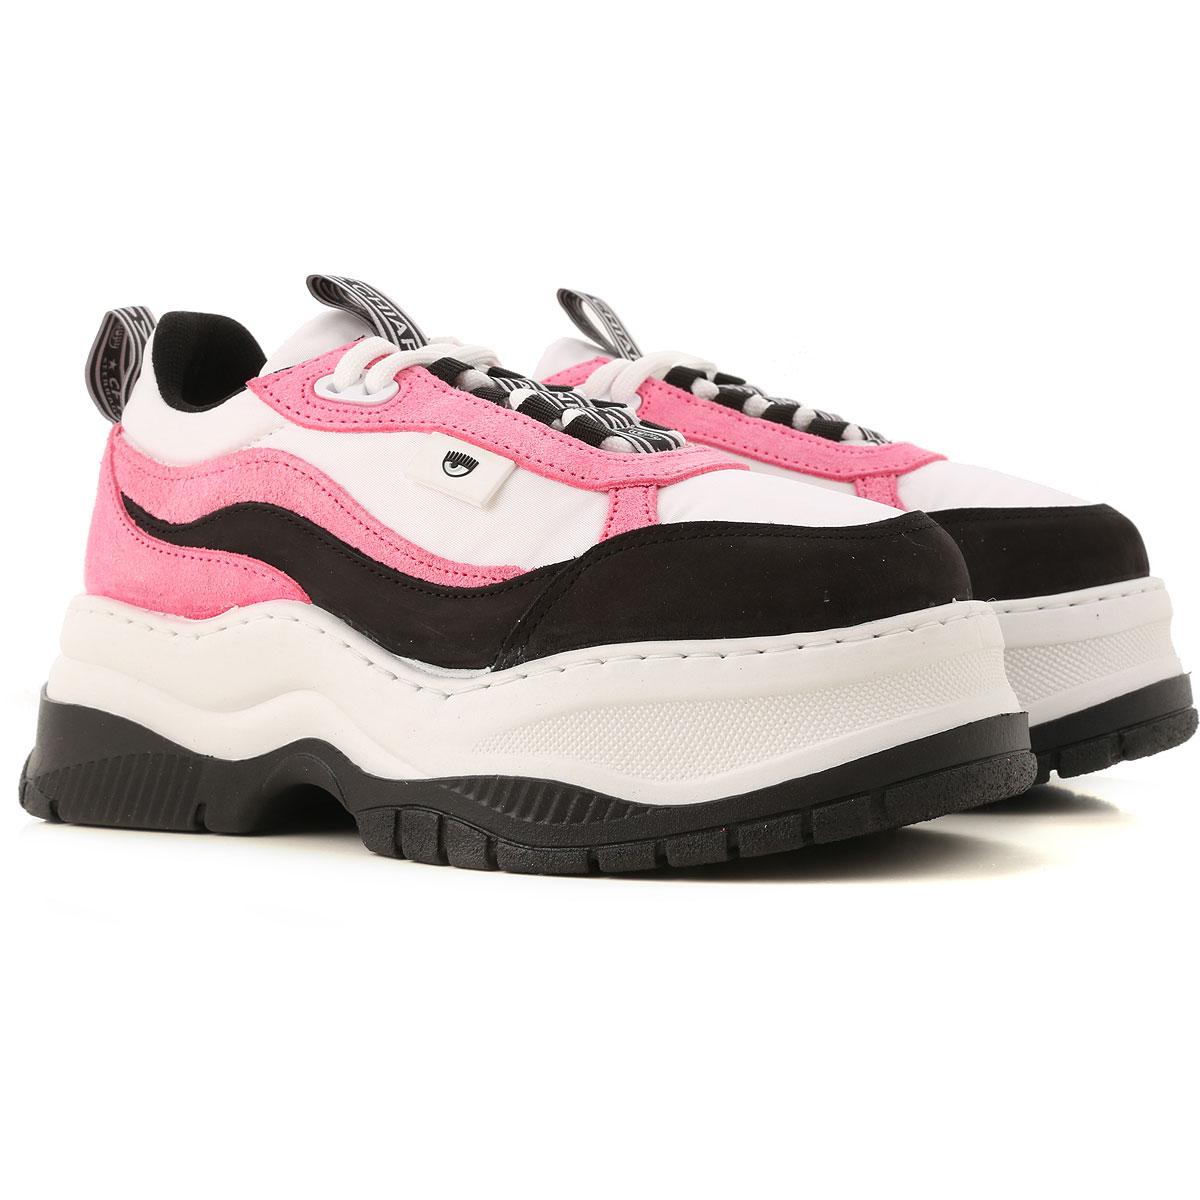 Chiara Ferragni Sneakers for Women On Sale, White, Leather, 2019, 10 11 6 9